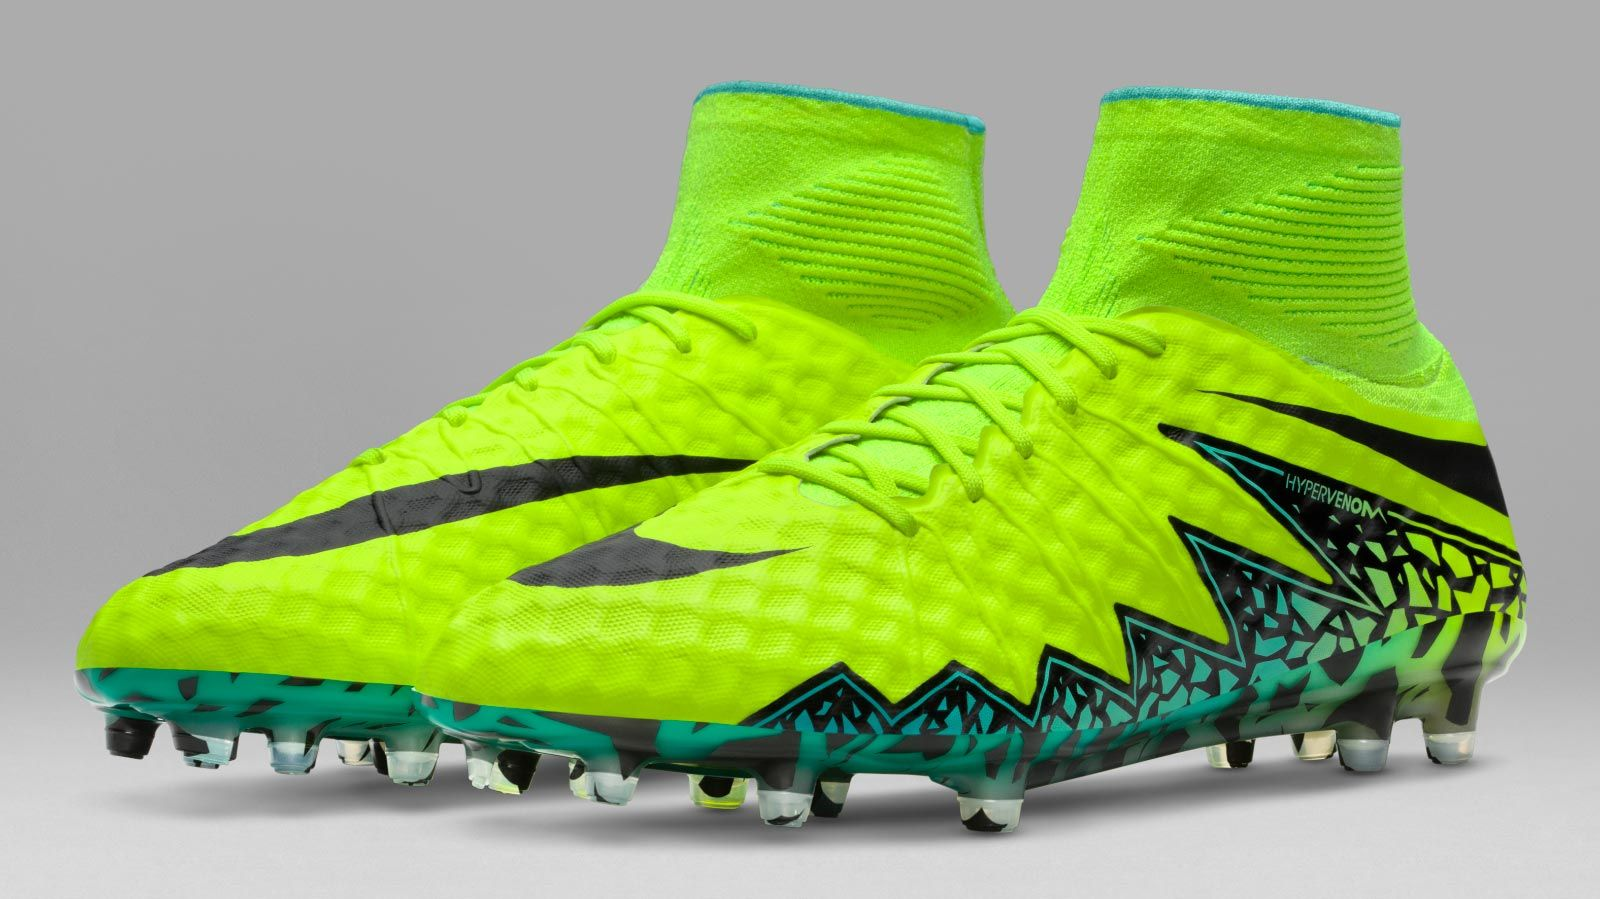 Nike Hypervenom Phantom II Euro 2016 Boots Released - Footy Headlines